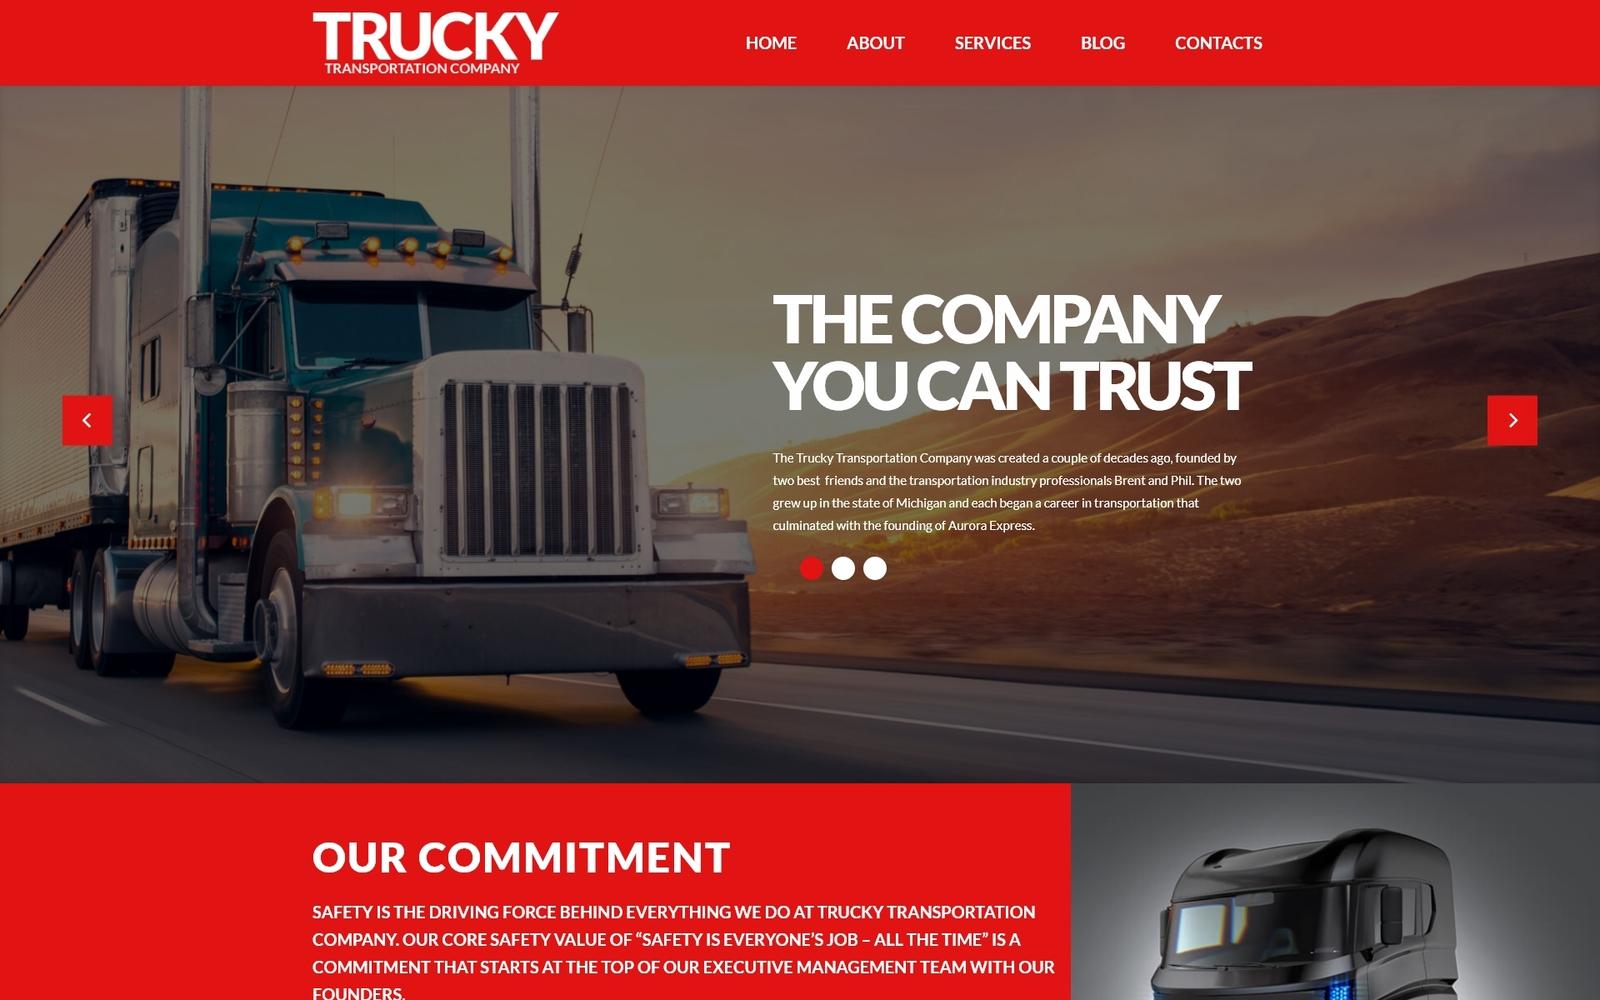 Trucky - Transportation & Logistics Responsive WordPress Theme Tema WordPress №53388